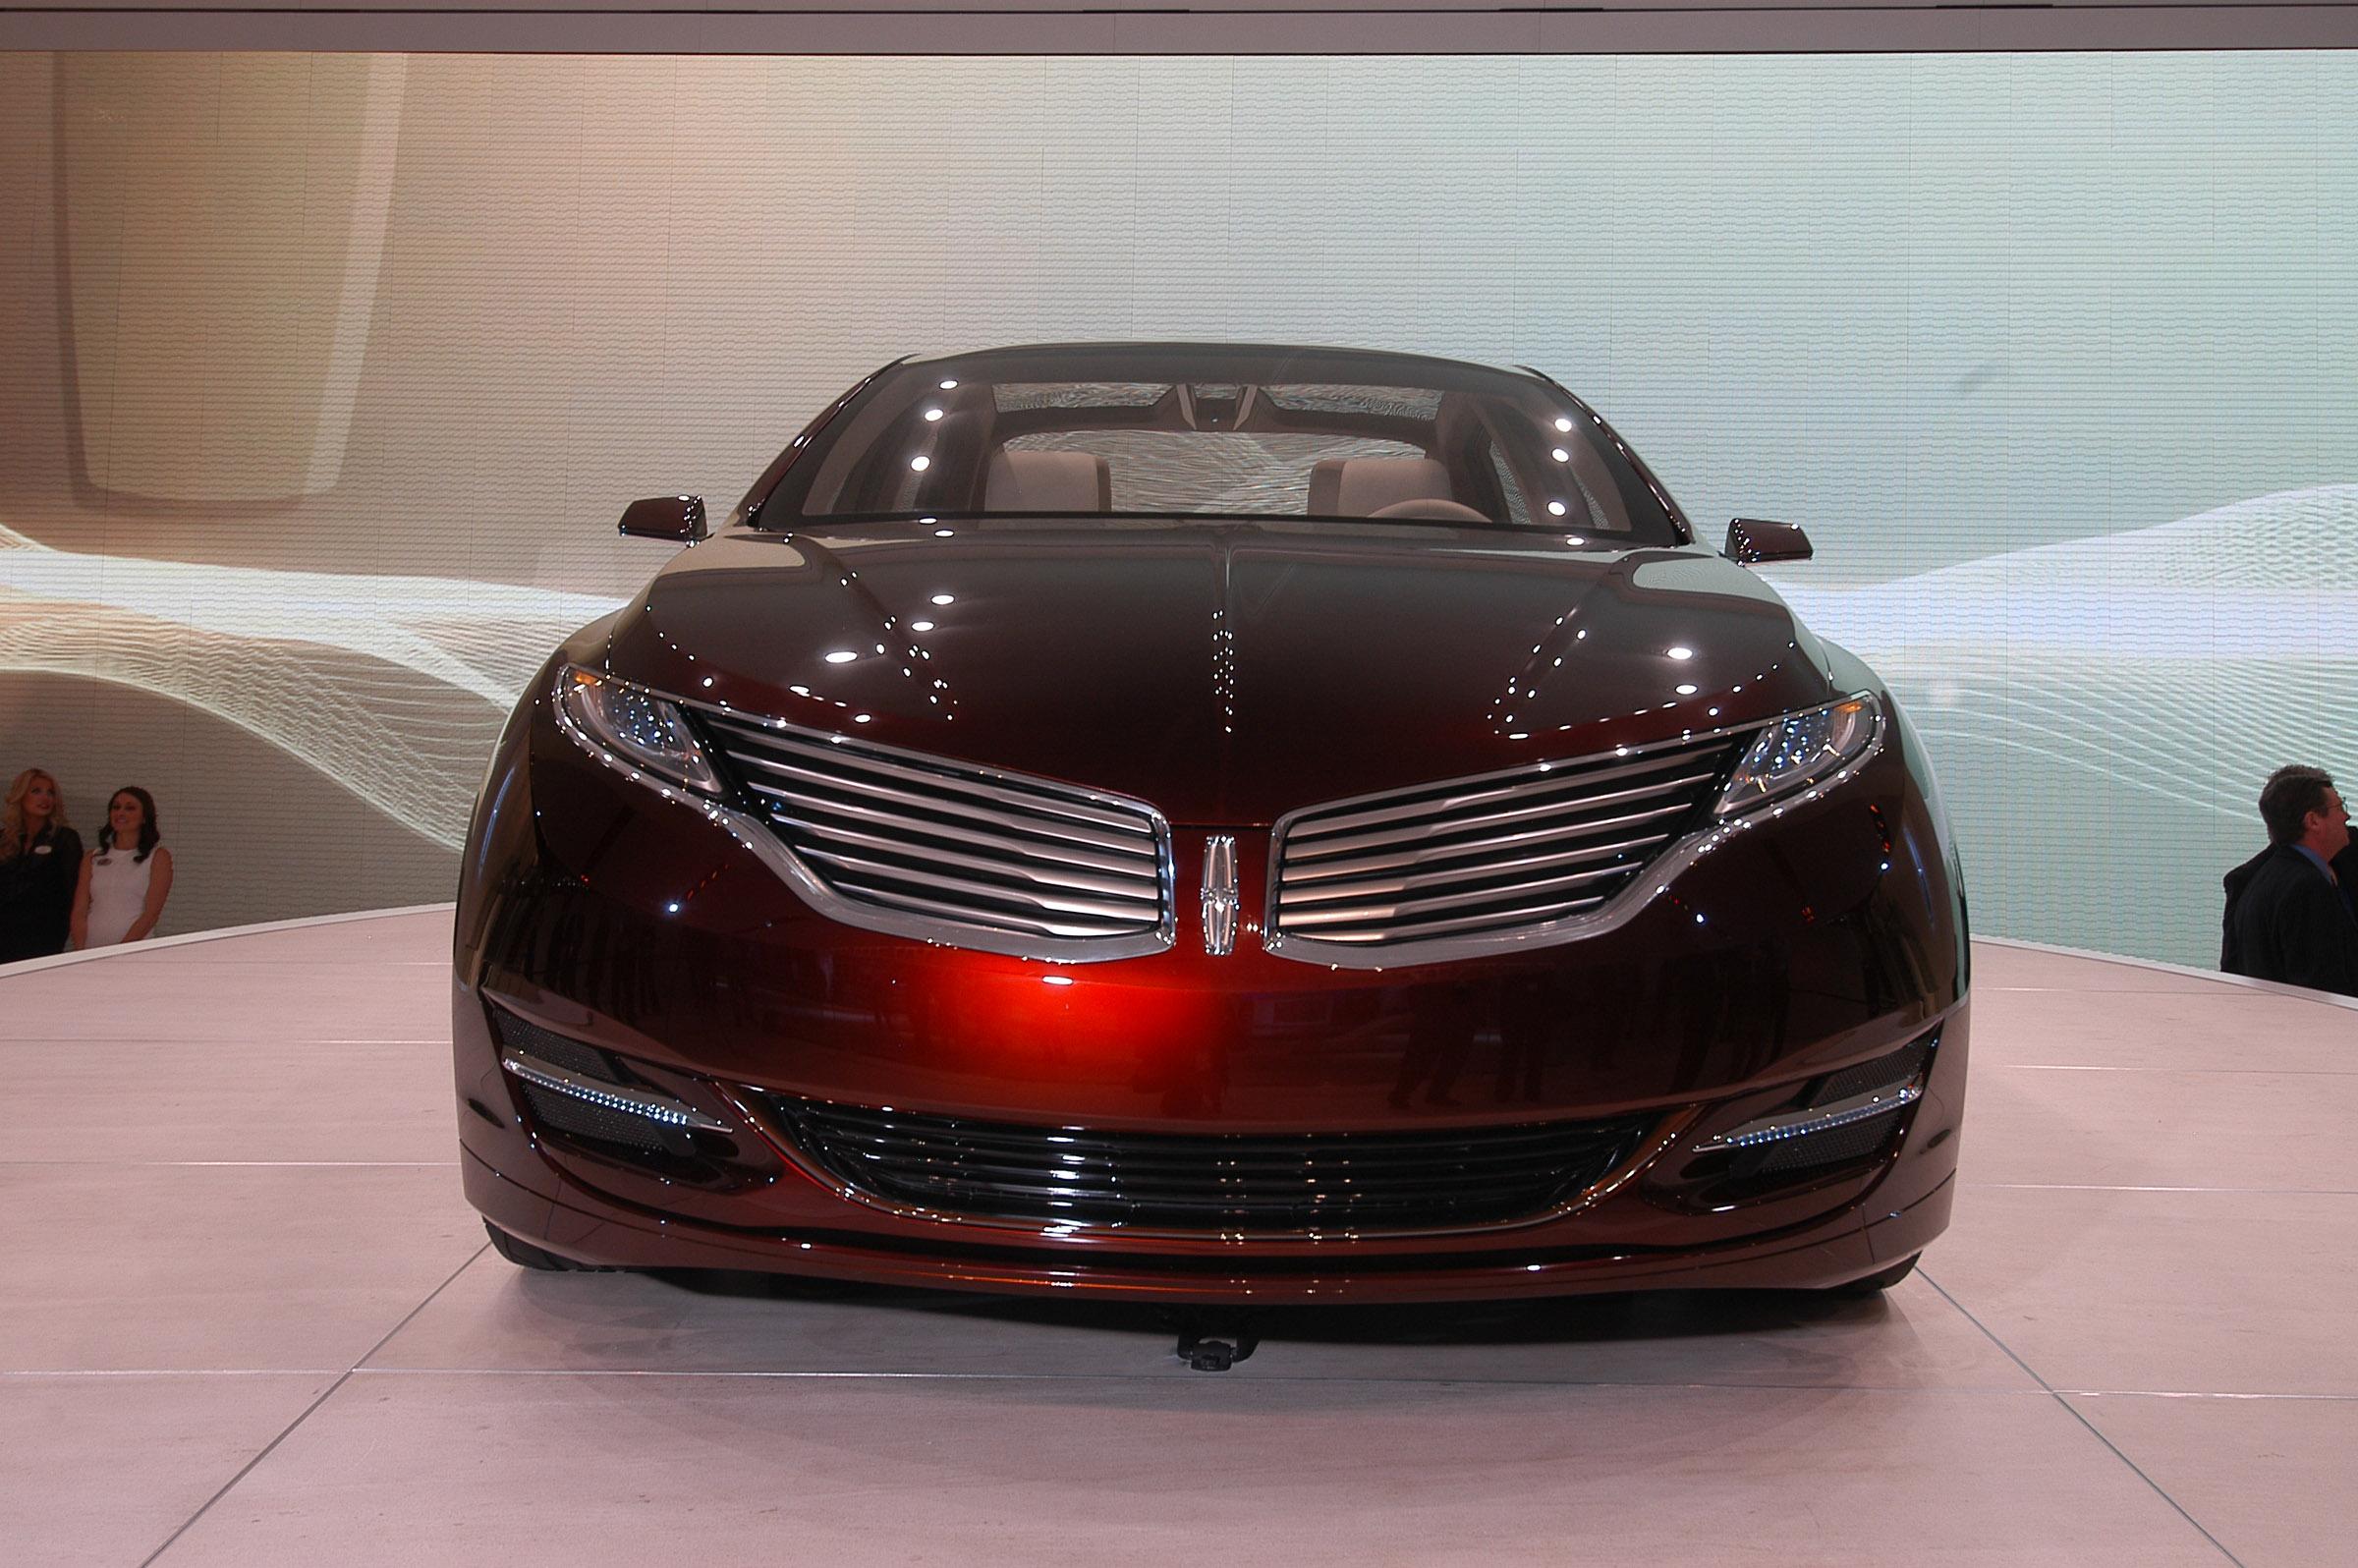 https://www.automobilesreview.com/gallery/lincoln-mkz-concept-detroit-2012/lincoln-mkz-concept-detroit-2012-07.jpg